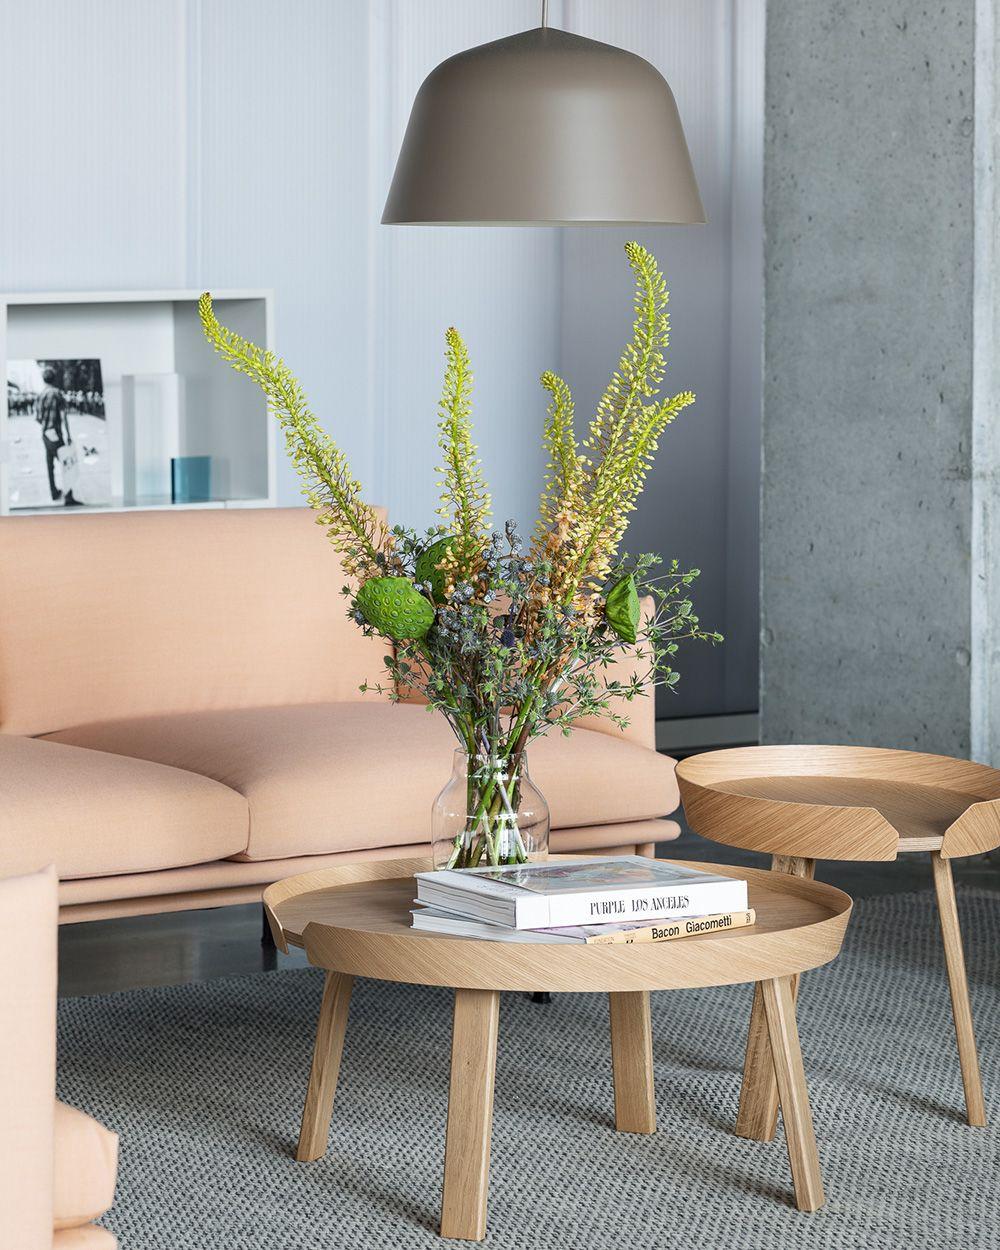 Timeless And Modern Wooden Sofa Table Home Decor Inspiratioon From Muuto Scandinavian Design Coffee Table Coffee Table Furniture Design Unique Furniture Design [ 1250 x 1000 Pixel ]